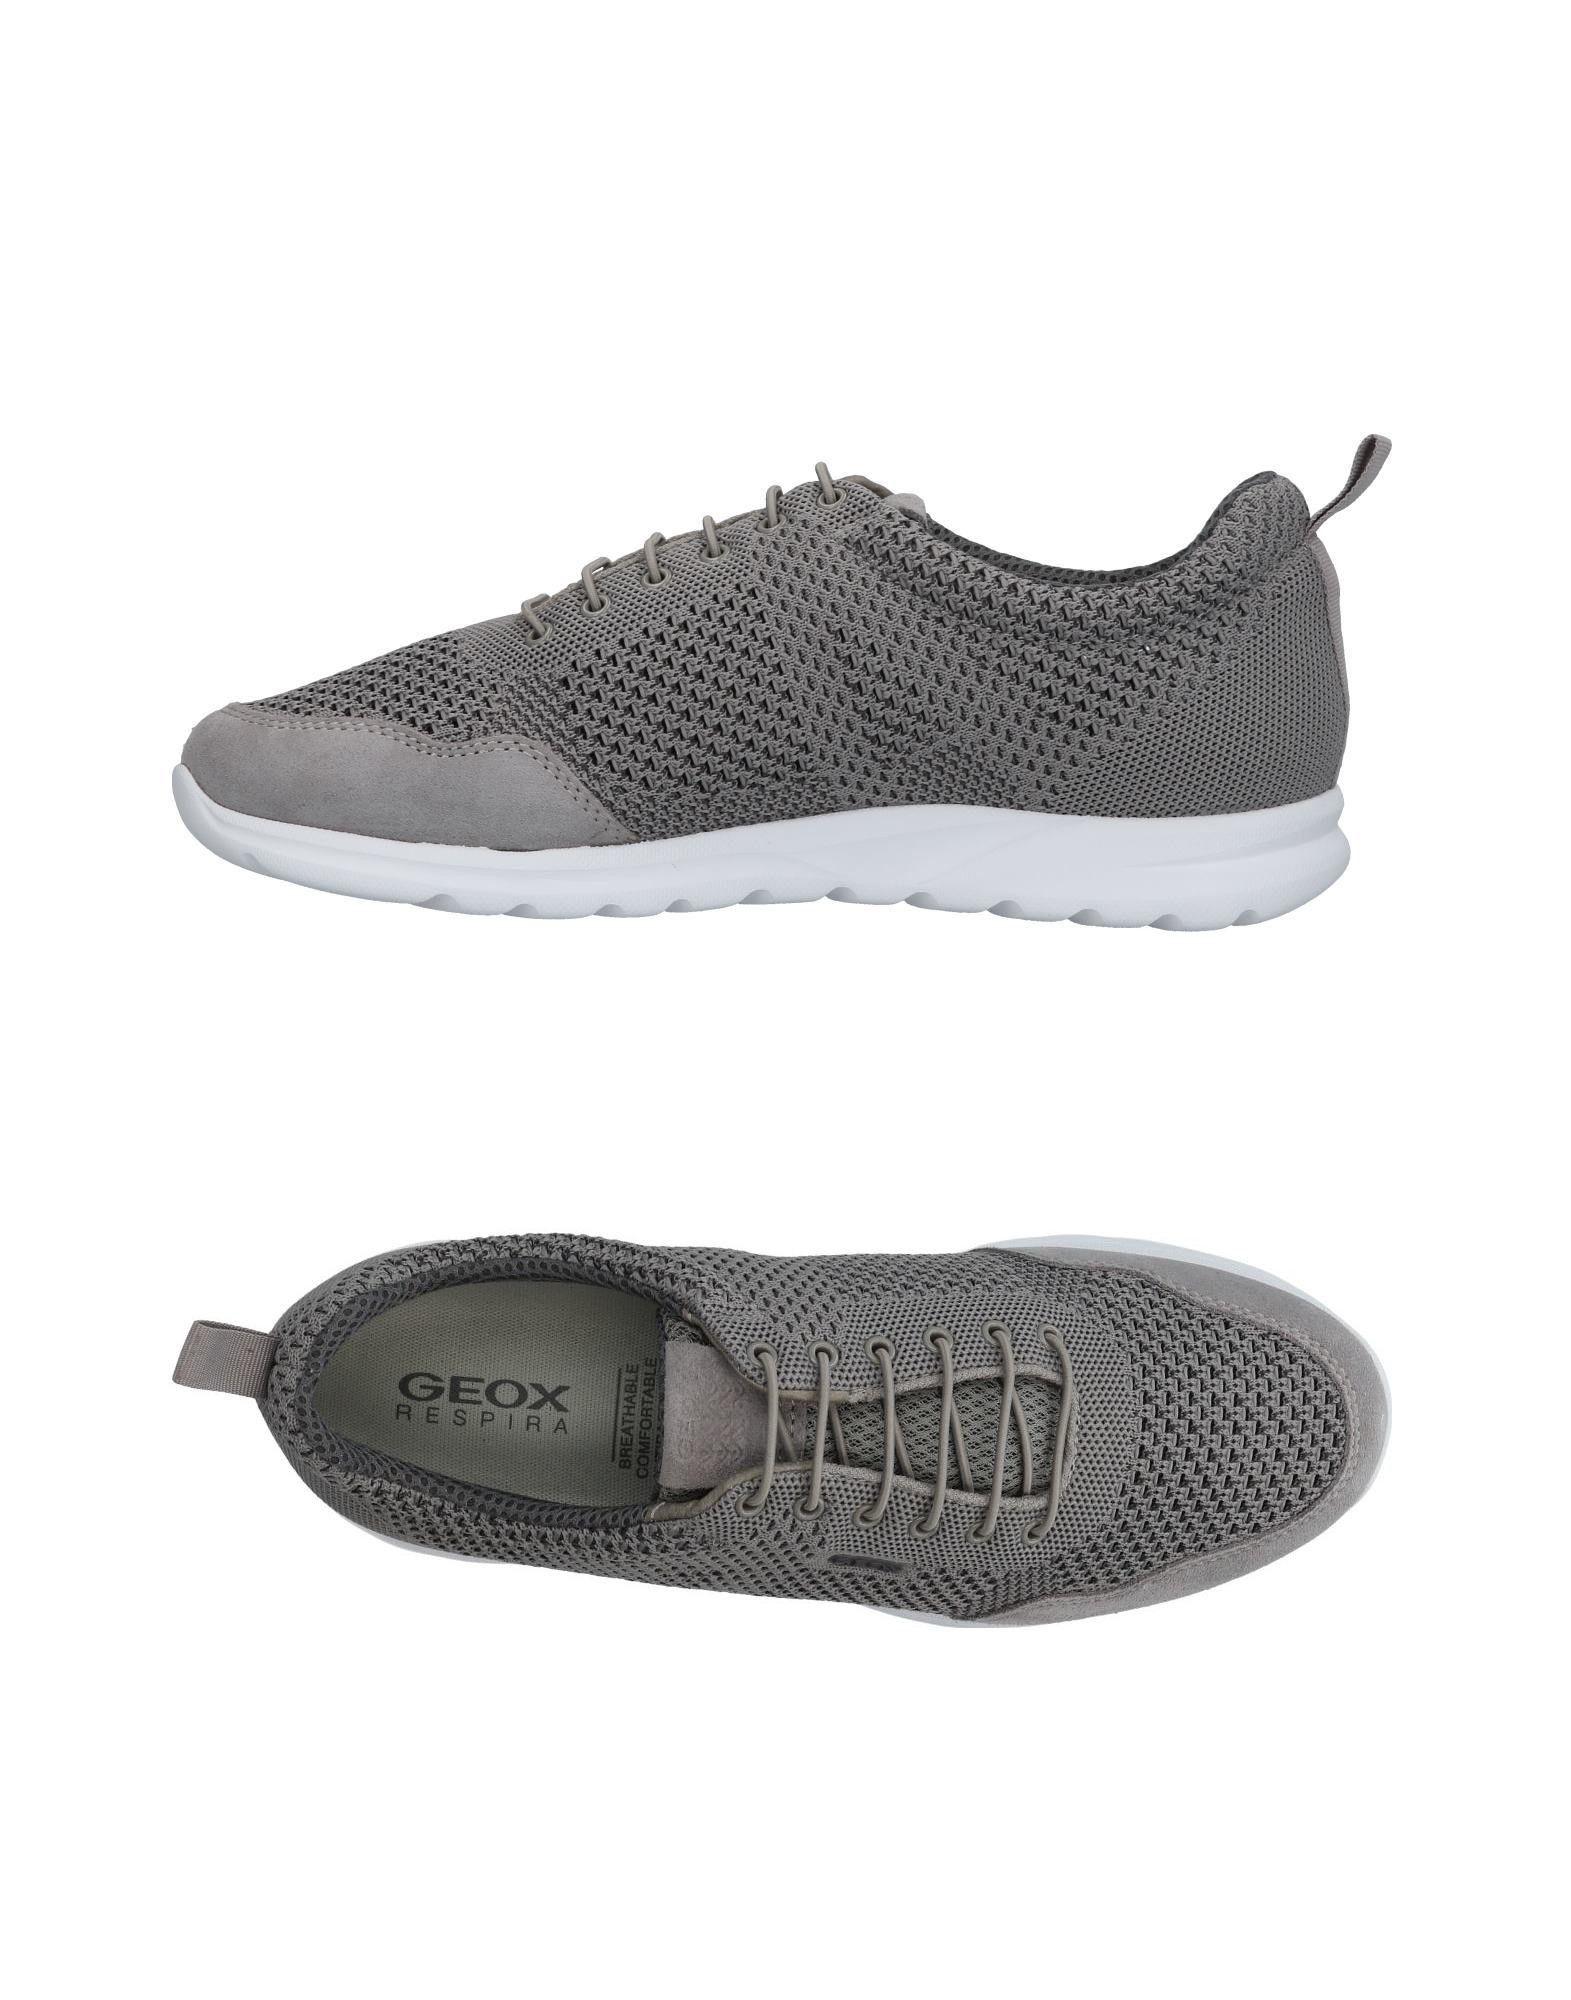 Geox Sneakers - Men  Geox Sneakers online on  Men Australia - 11418335MC f4d3ed